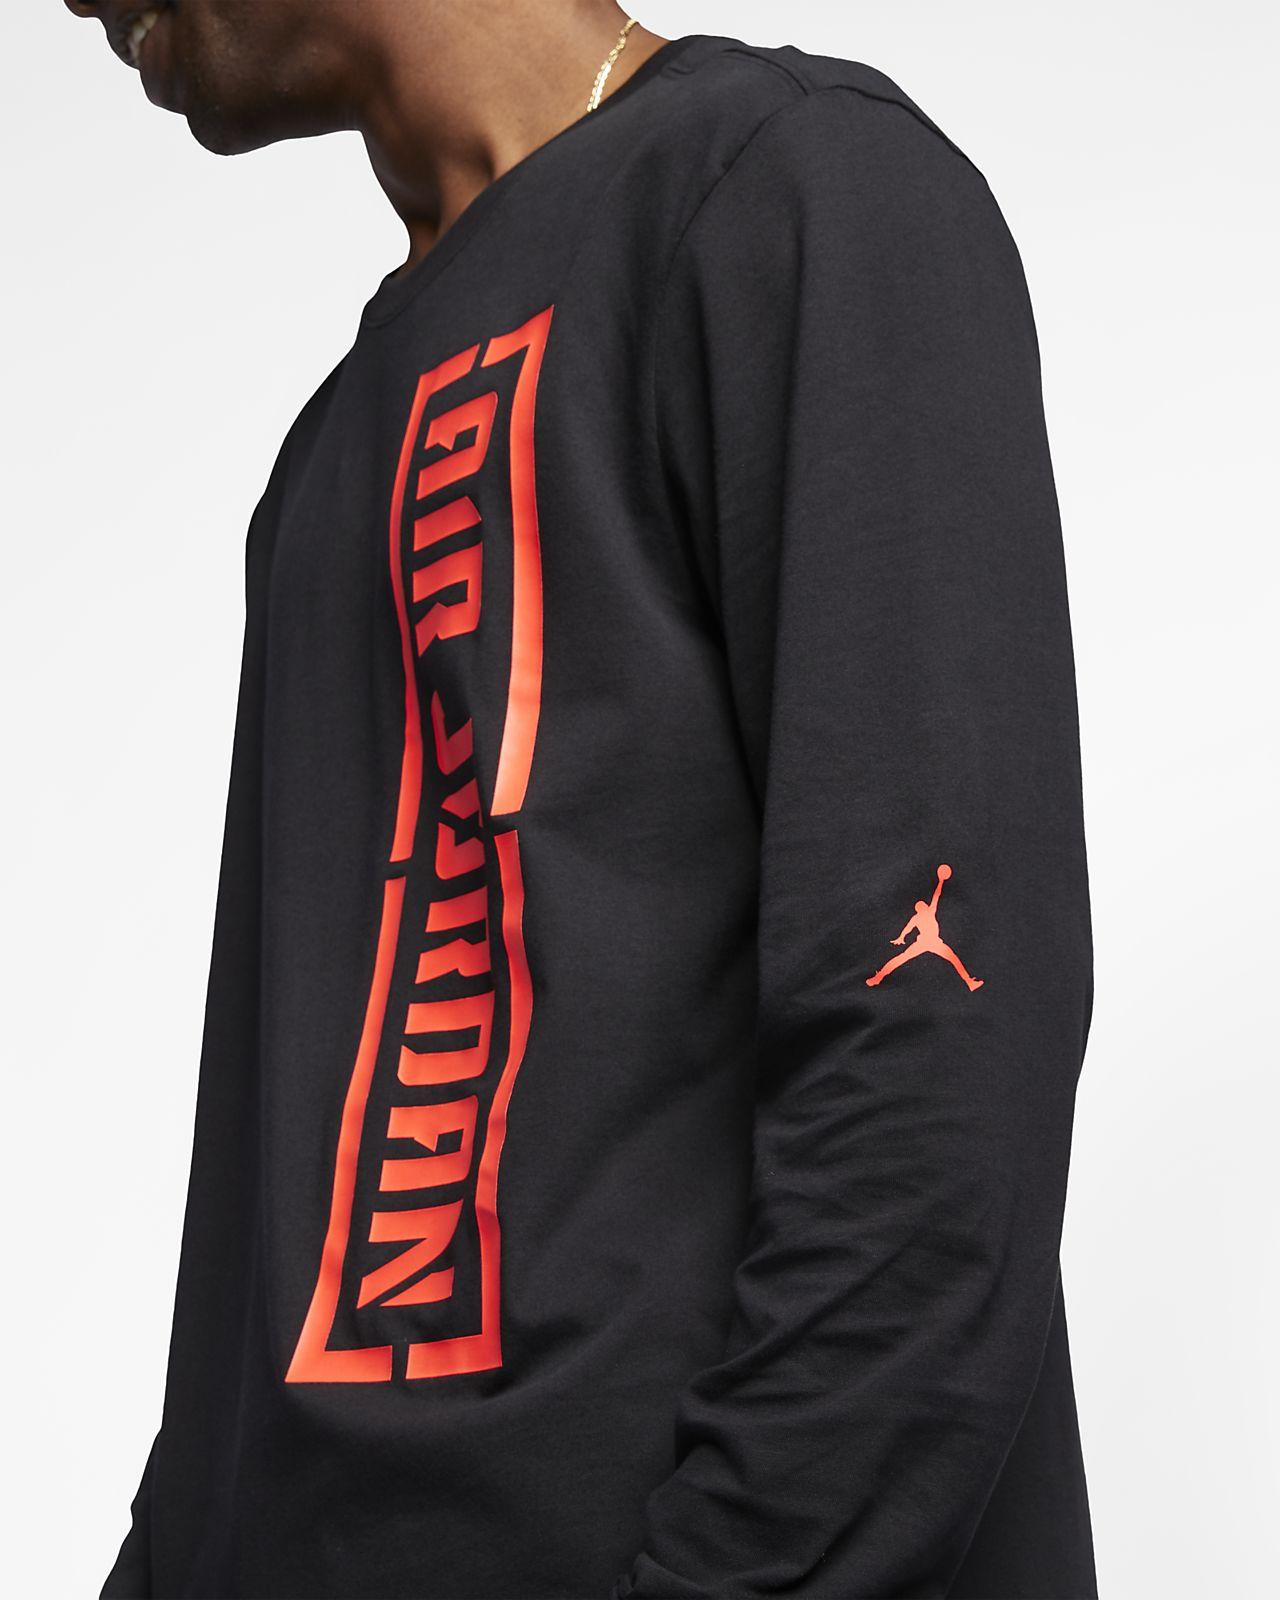 a144df4e01c0b2 Jordan Men s Long-Sleeve T-Shirt. Nike.com